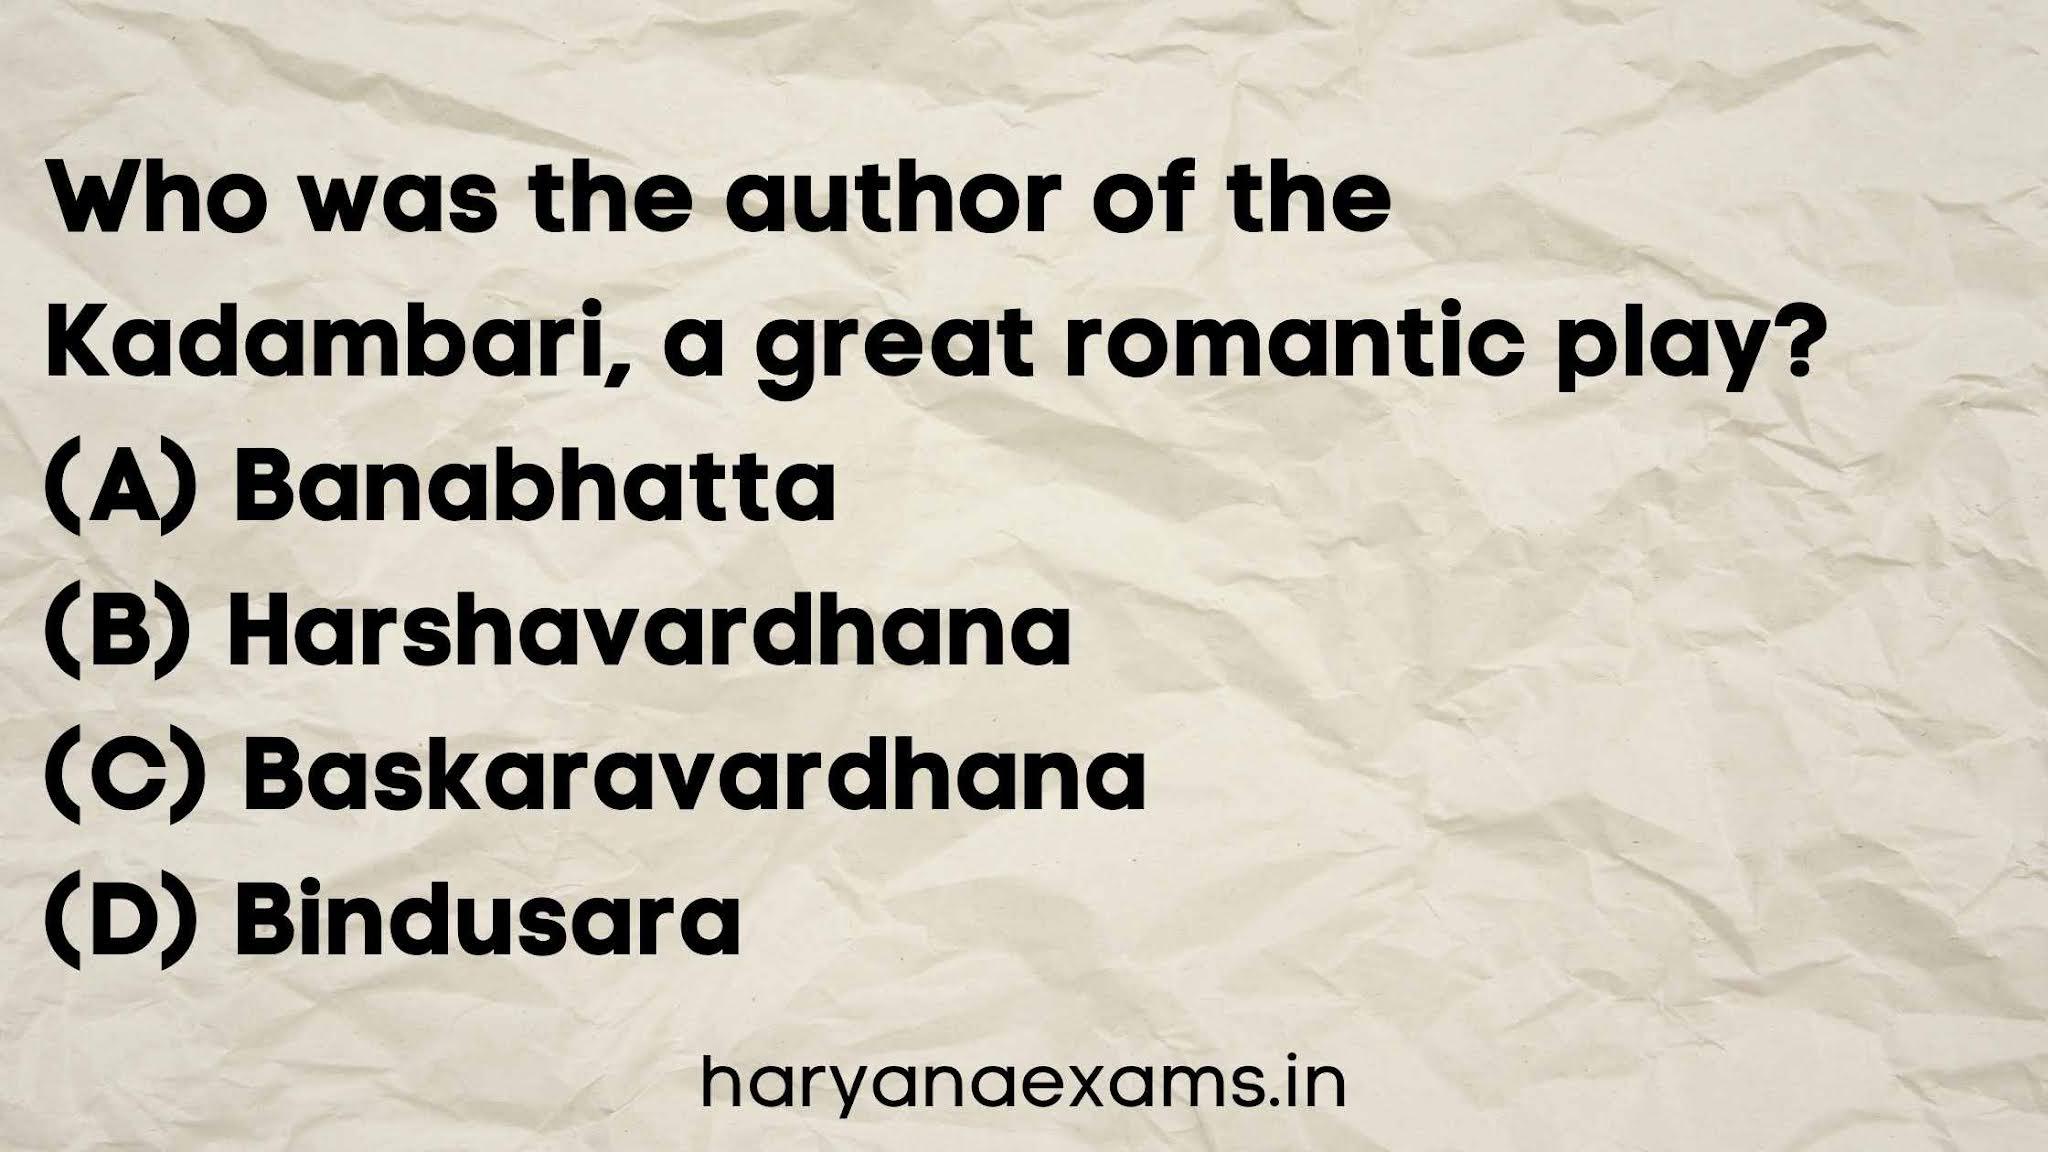 Who was the author of the Kadambari, a great romantic play?   (A) Banabhatta   (B) Harshavardhana   (C) Baskaravardhana   (D) Bindusara